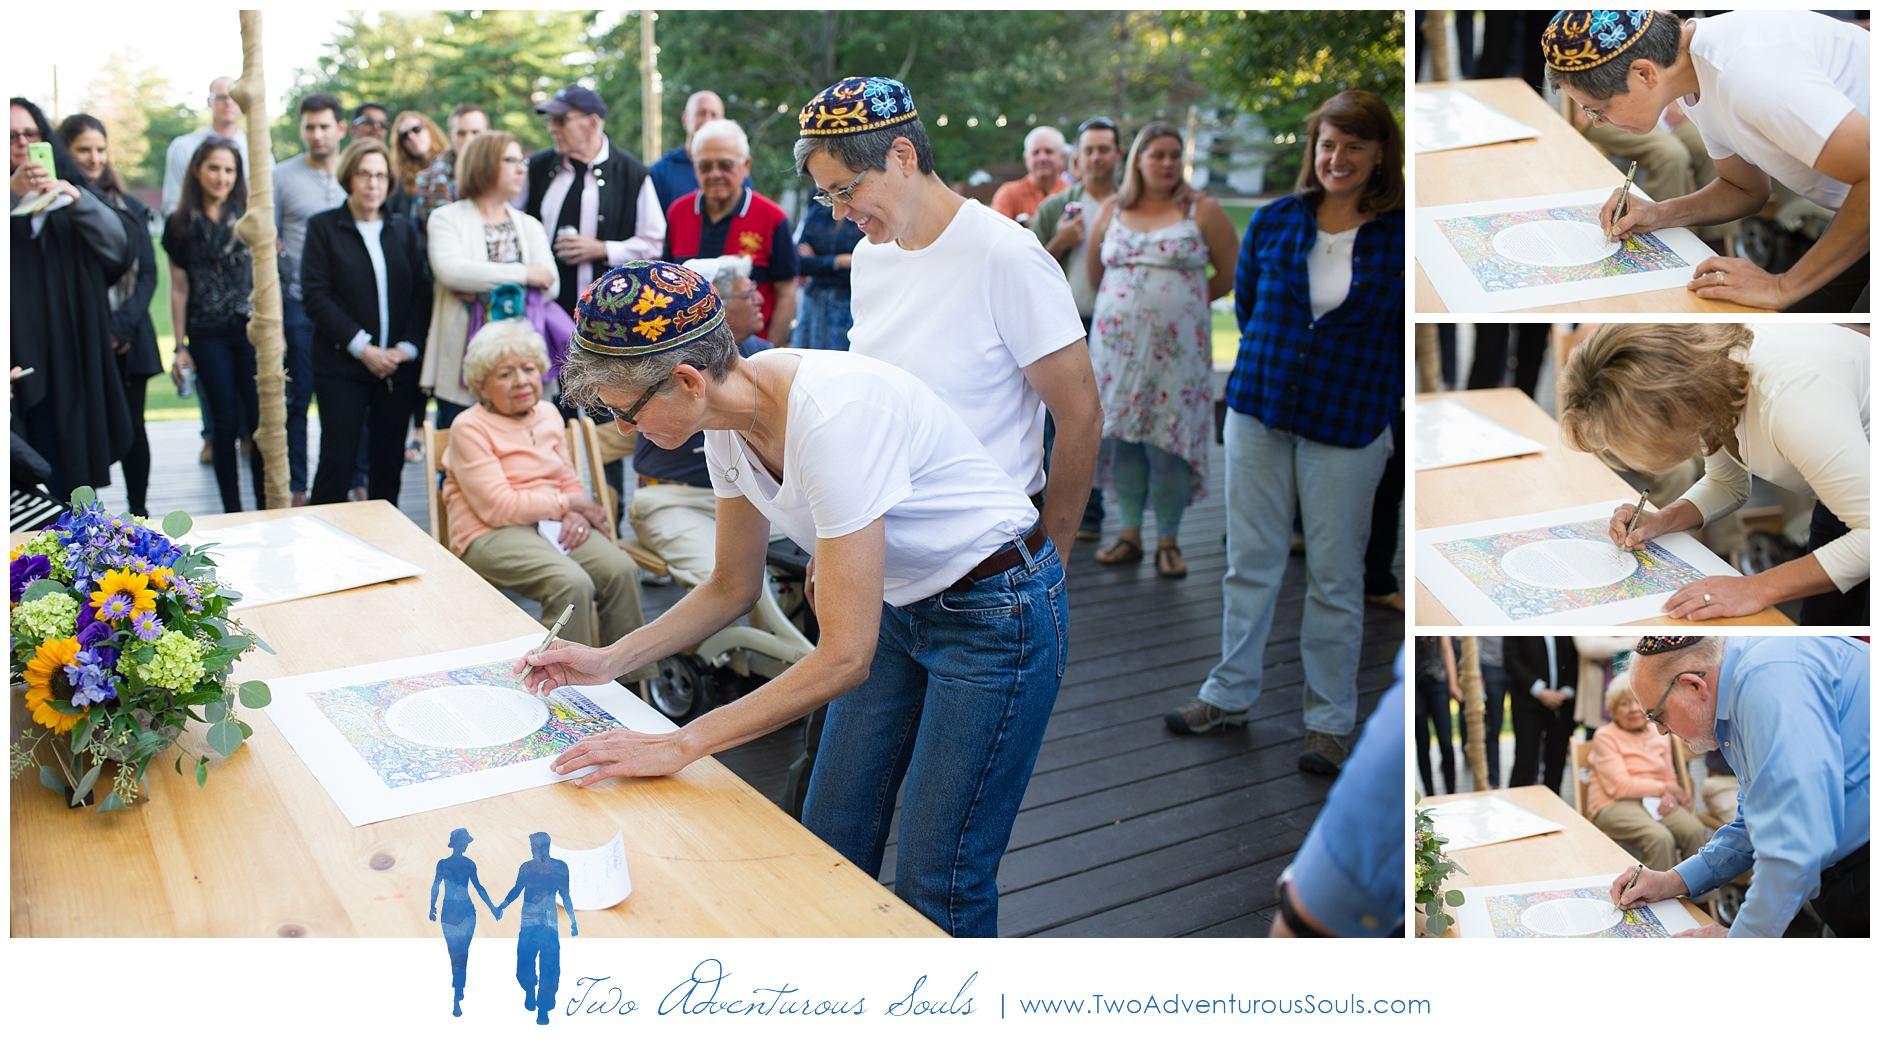 090217-Mindy-Karen-sneaks-50_WEB-Maine-Wedding-and-Portrait-Photographer.jpg